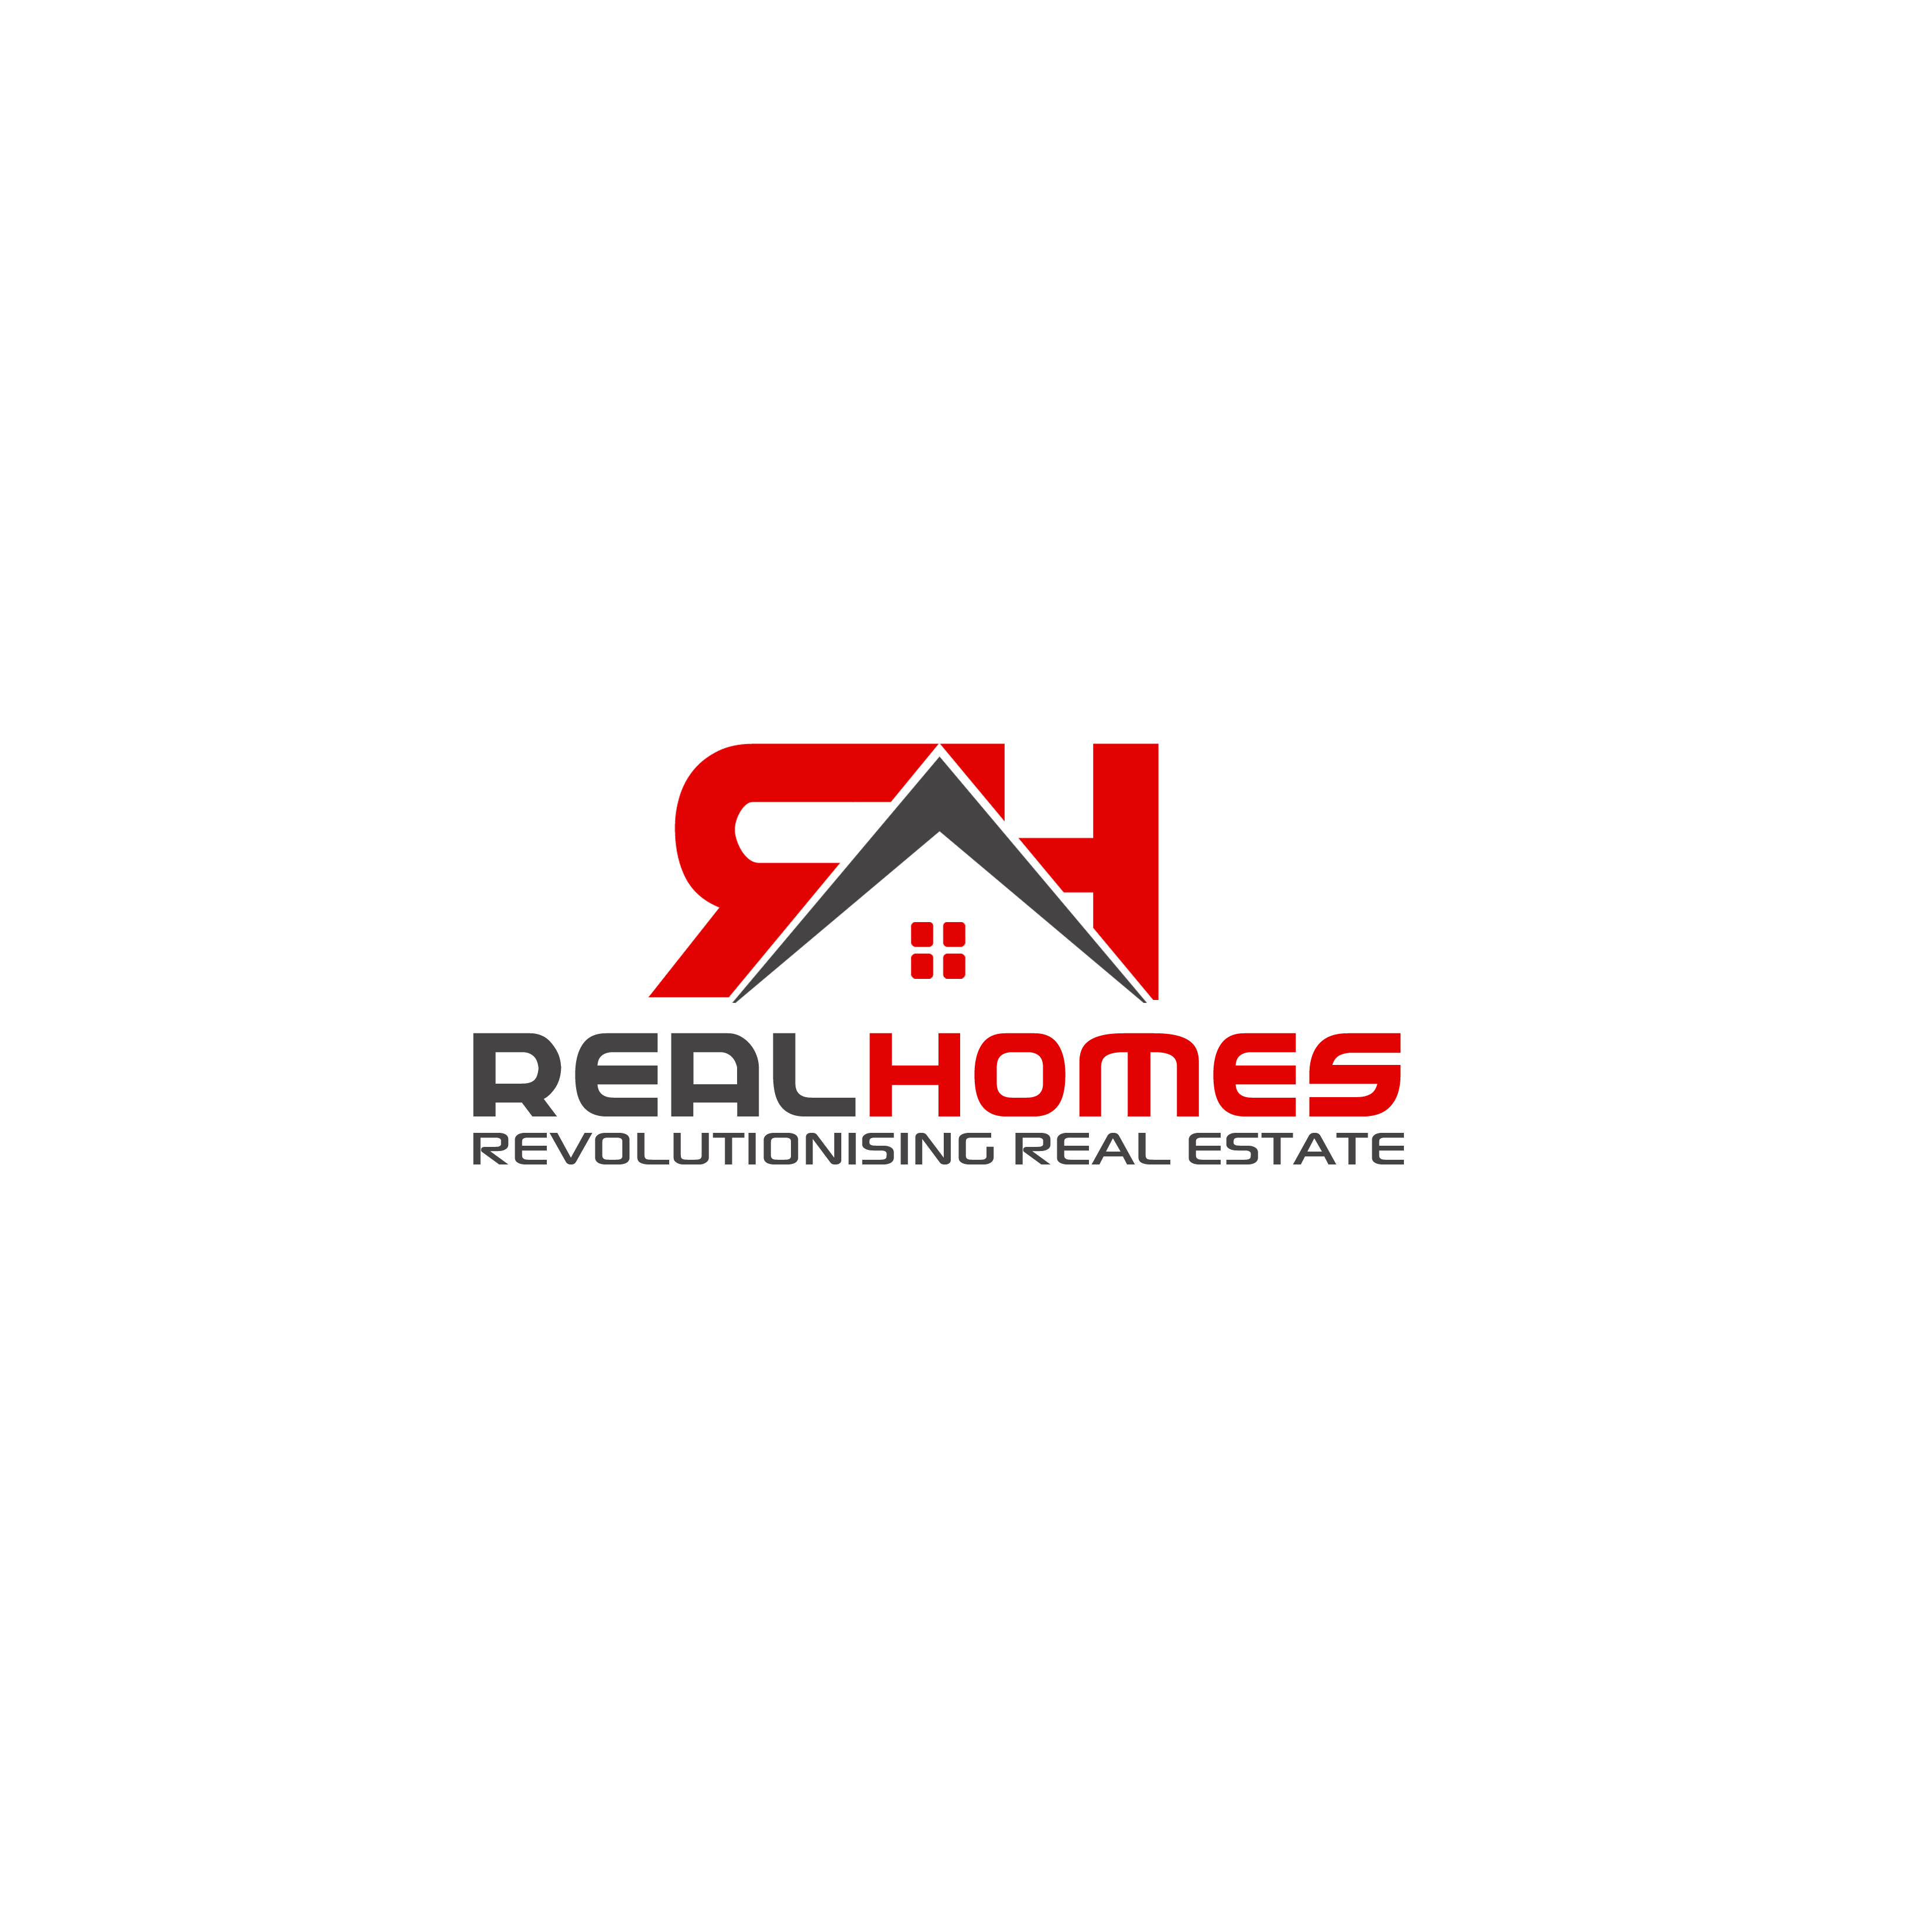 Logo Design by Allan Esclamado - Entry No. 132 in the Logo Design Contest Captivating Logo Design for Real Homes.